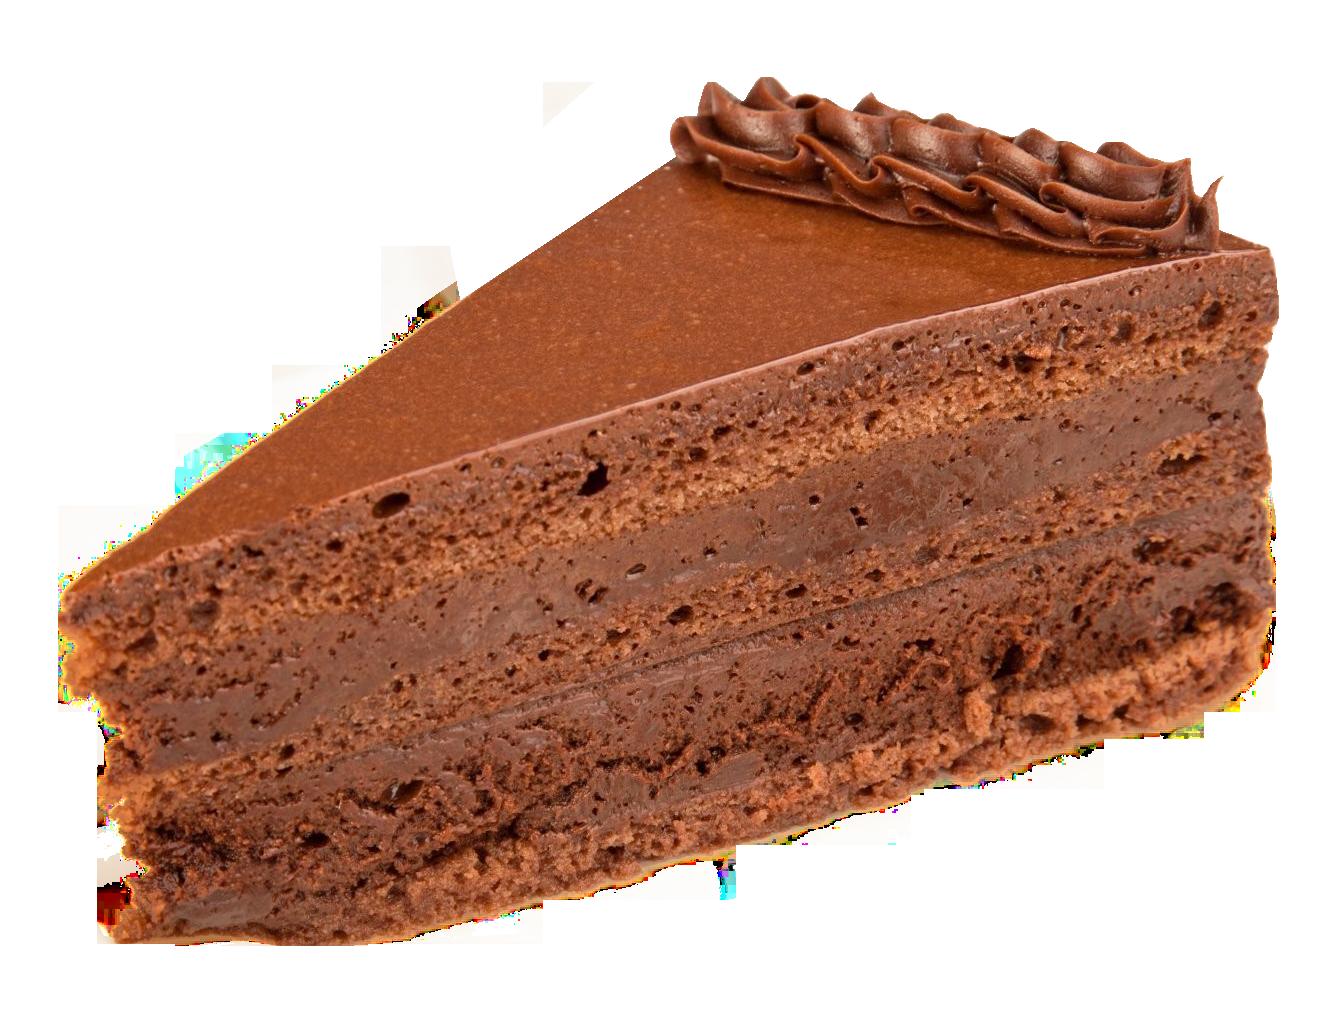 Cake Piece Chocolate Slice Baking Birthday Cake Cake